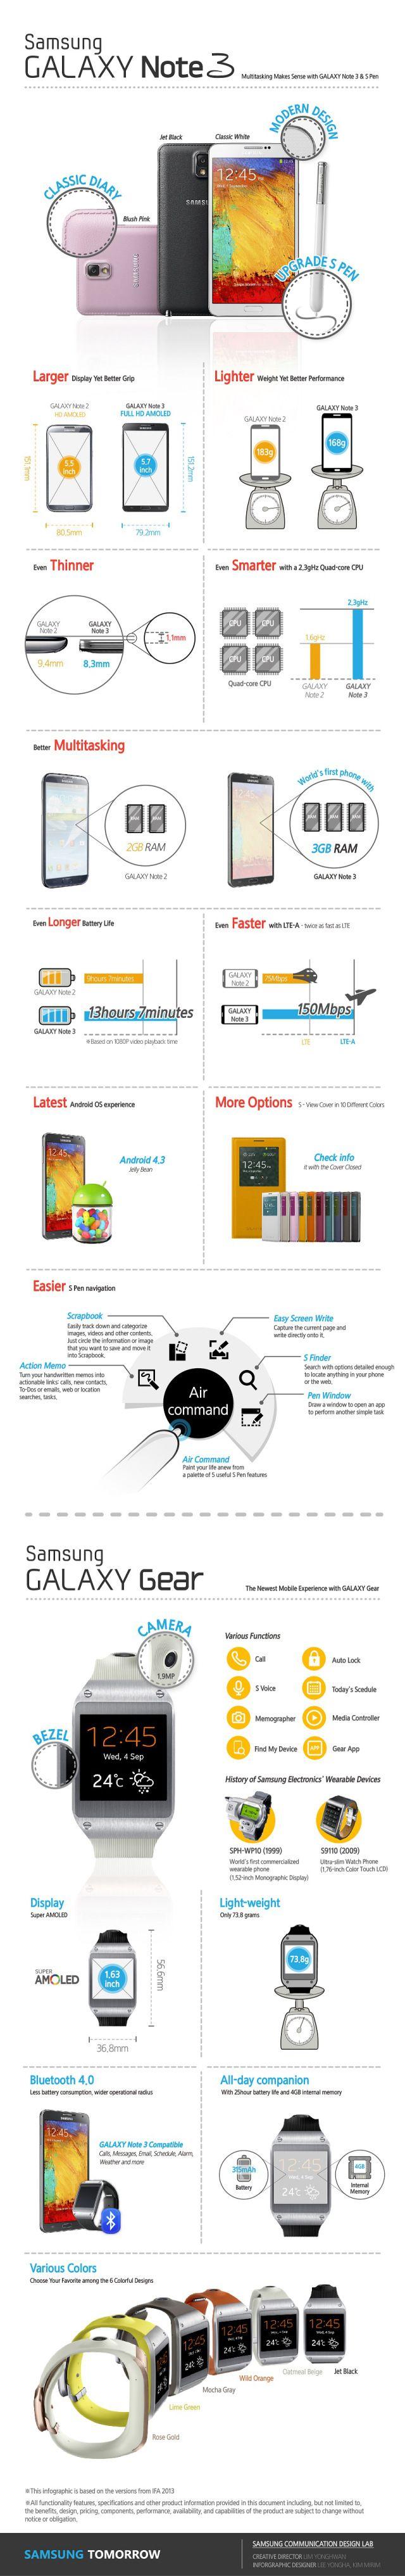 Samsung Galaxy Note 3 vs note 2